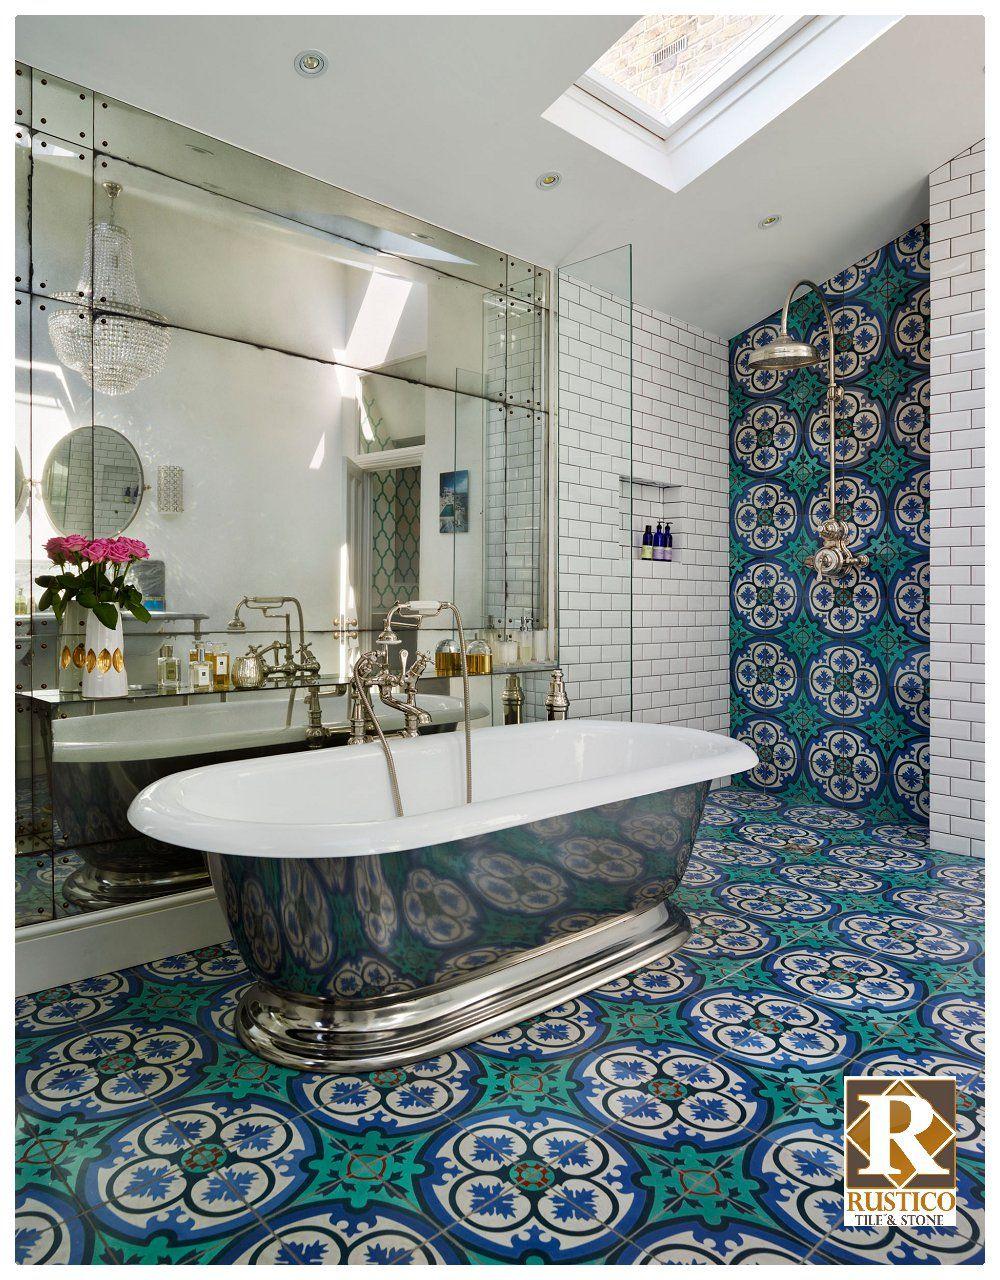 Spanish Style Bathroom Ideas Decorating Tips Mexican Style Decor Spanish Style Bathrooms Victorian Style Bathroom Bathroom Styling